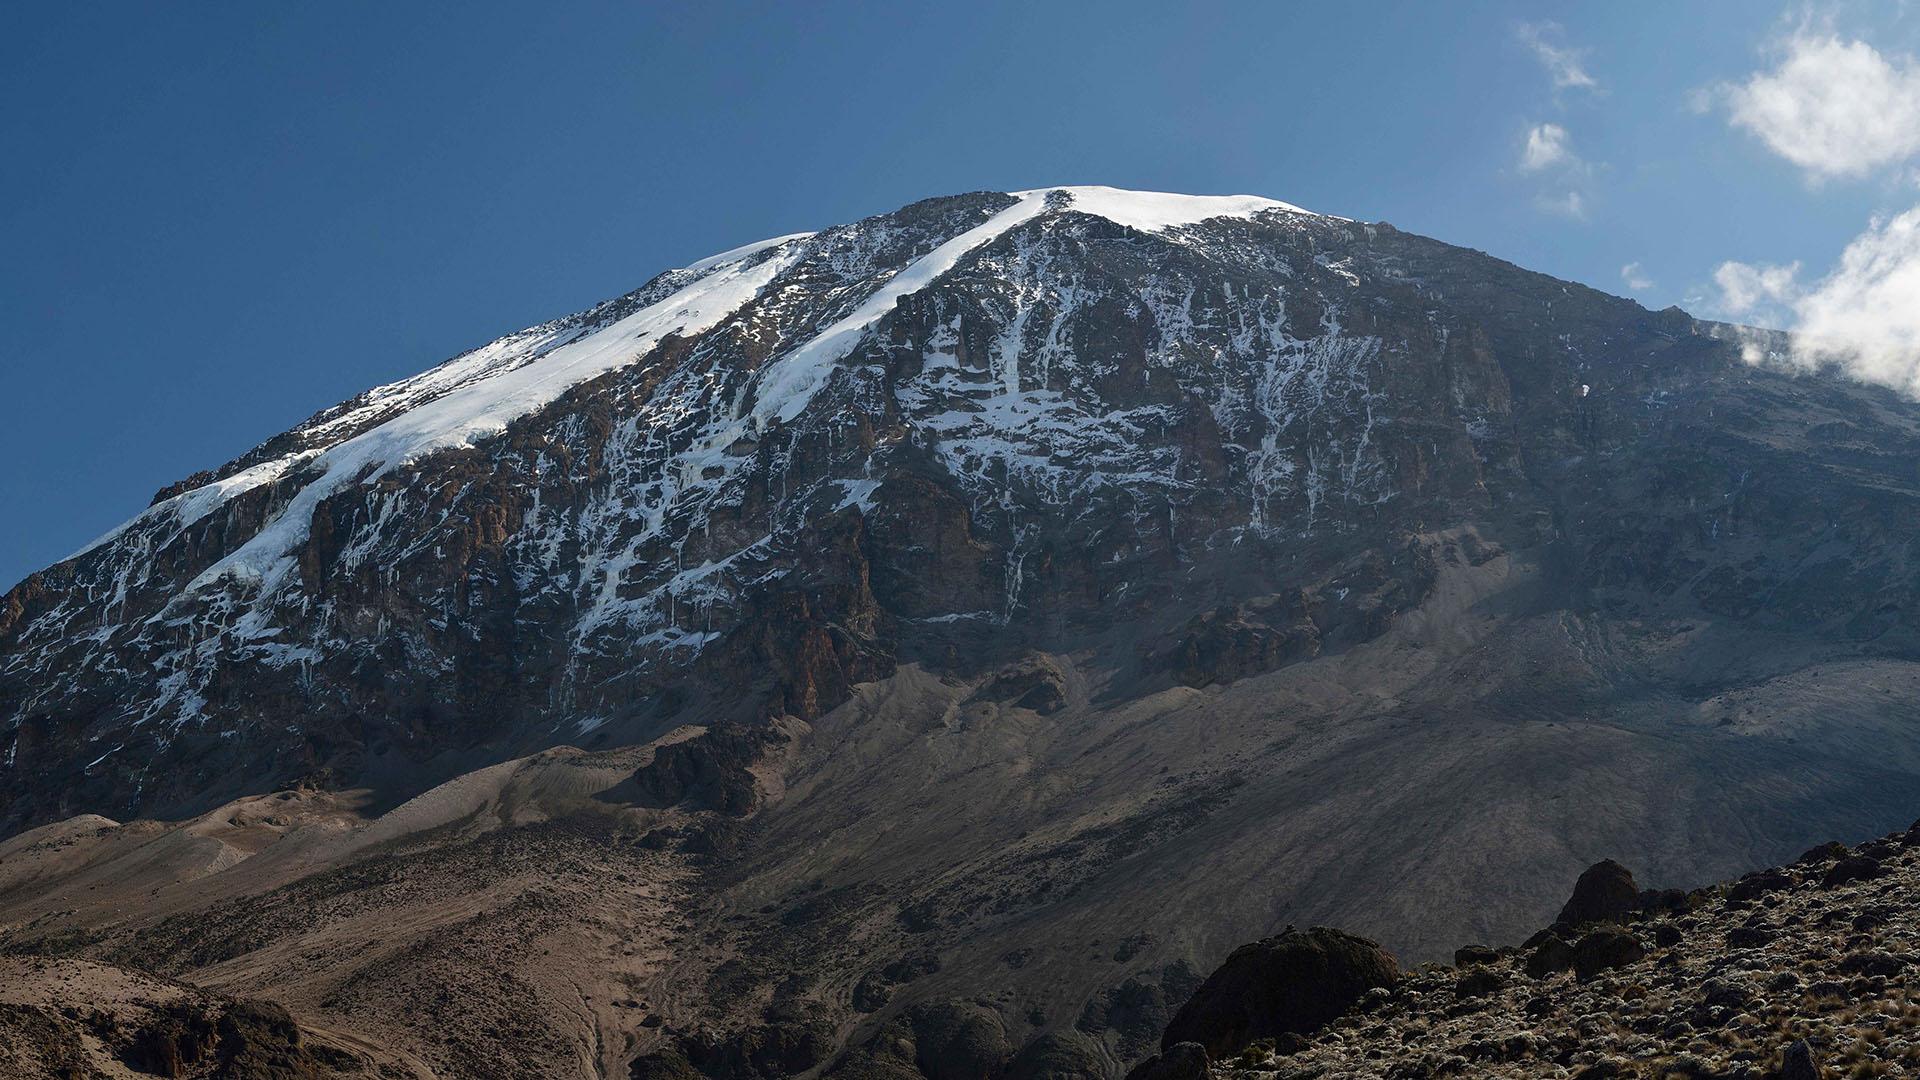 kilimanjaro-national-park-destinations-tanzania-maasai-wanderings-africa-mountain-range.jpg